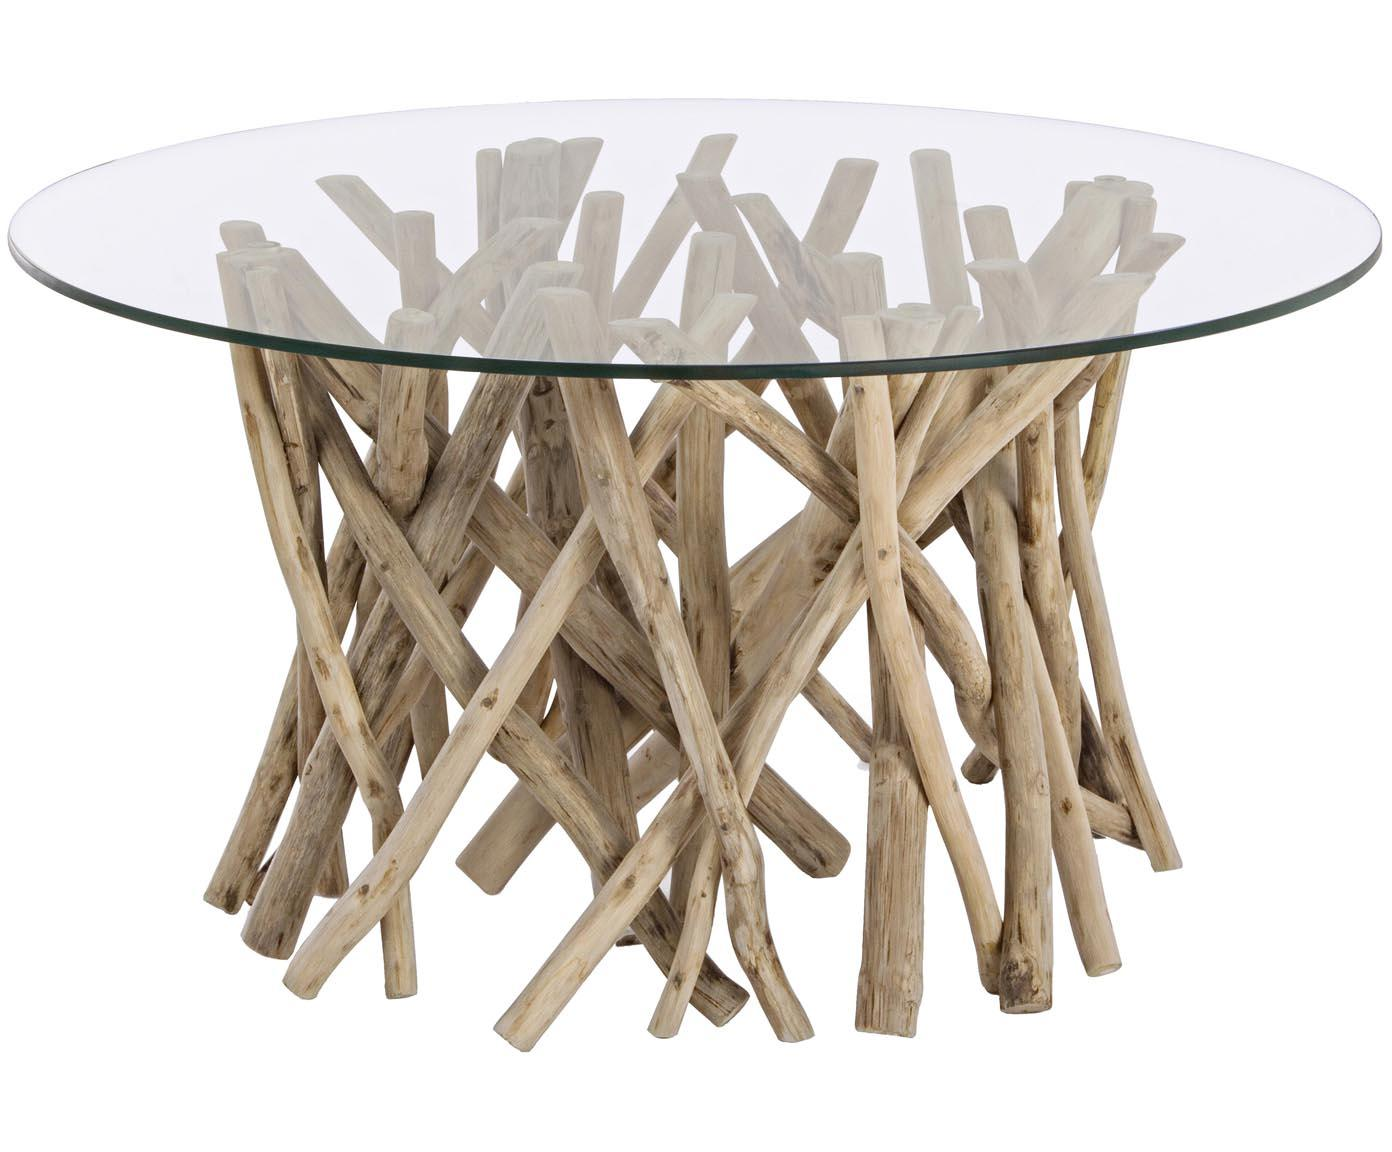 Mesa de centro de teca Samira, Tablero: vidrio templado, Estructura: madera de teca blanca y e, Transaparente, teca blanqueada patinada, An 80 x F 80 cm